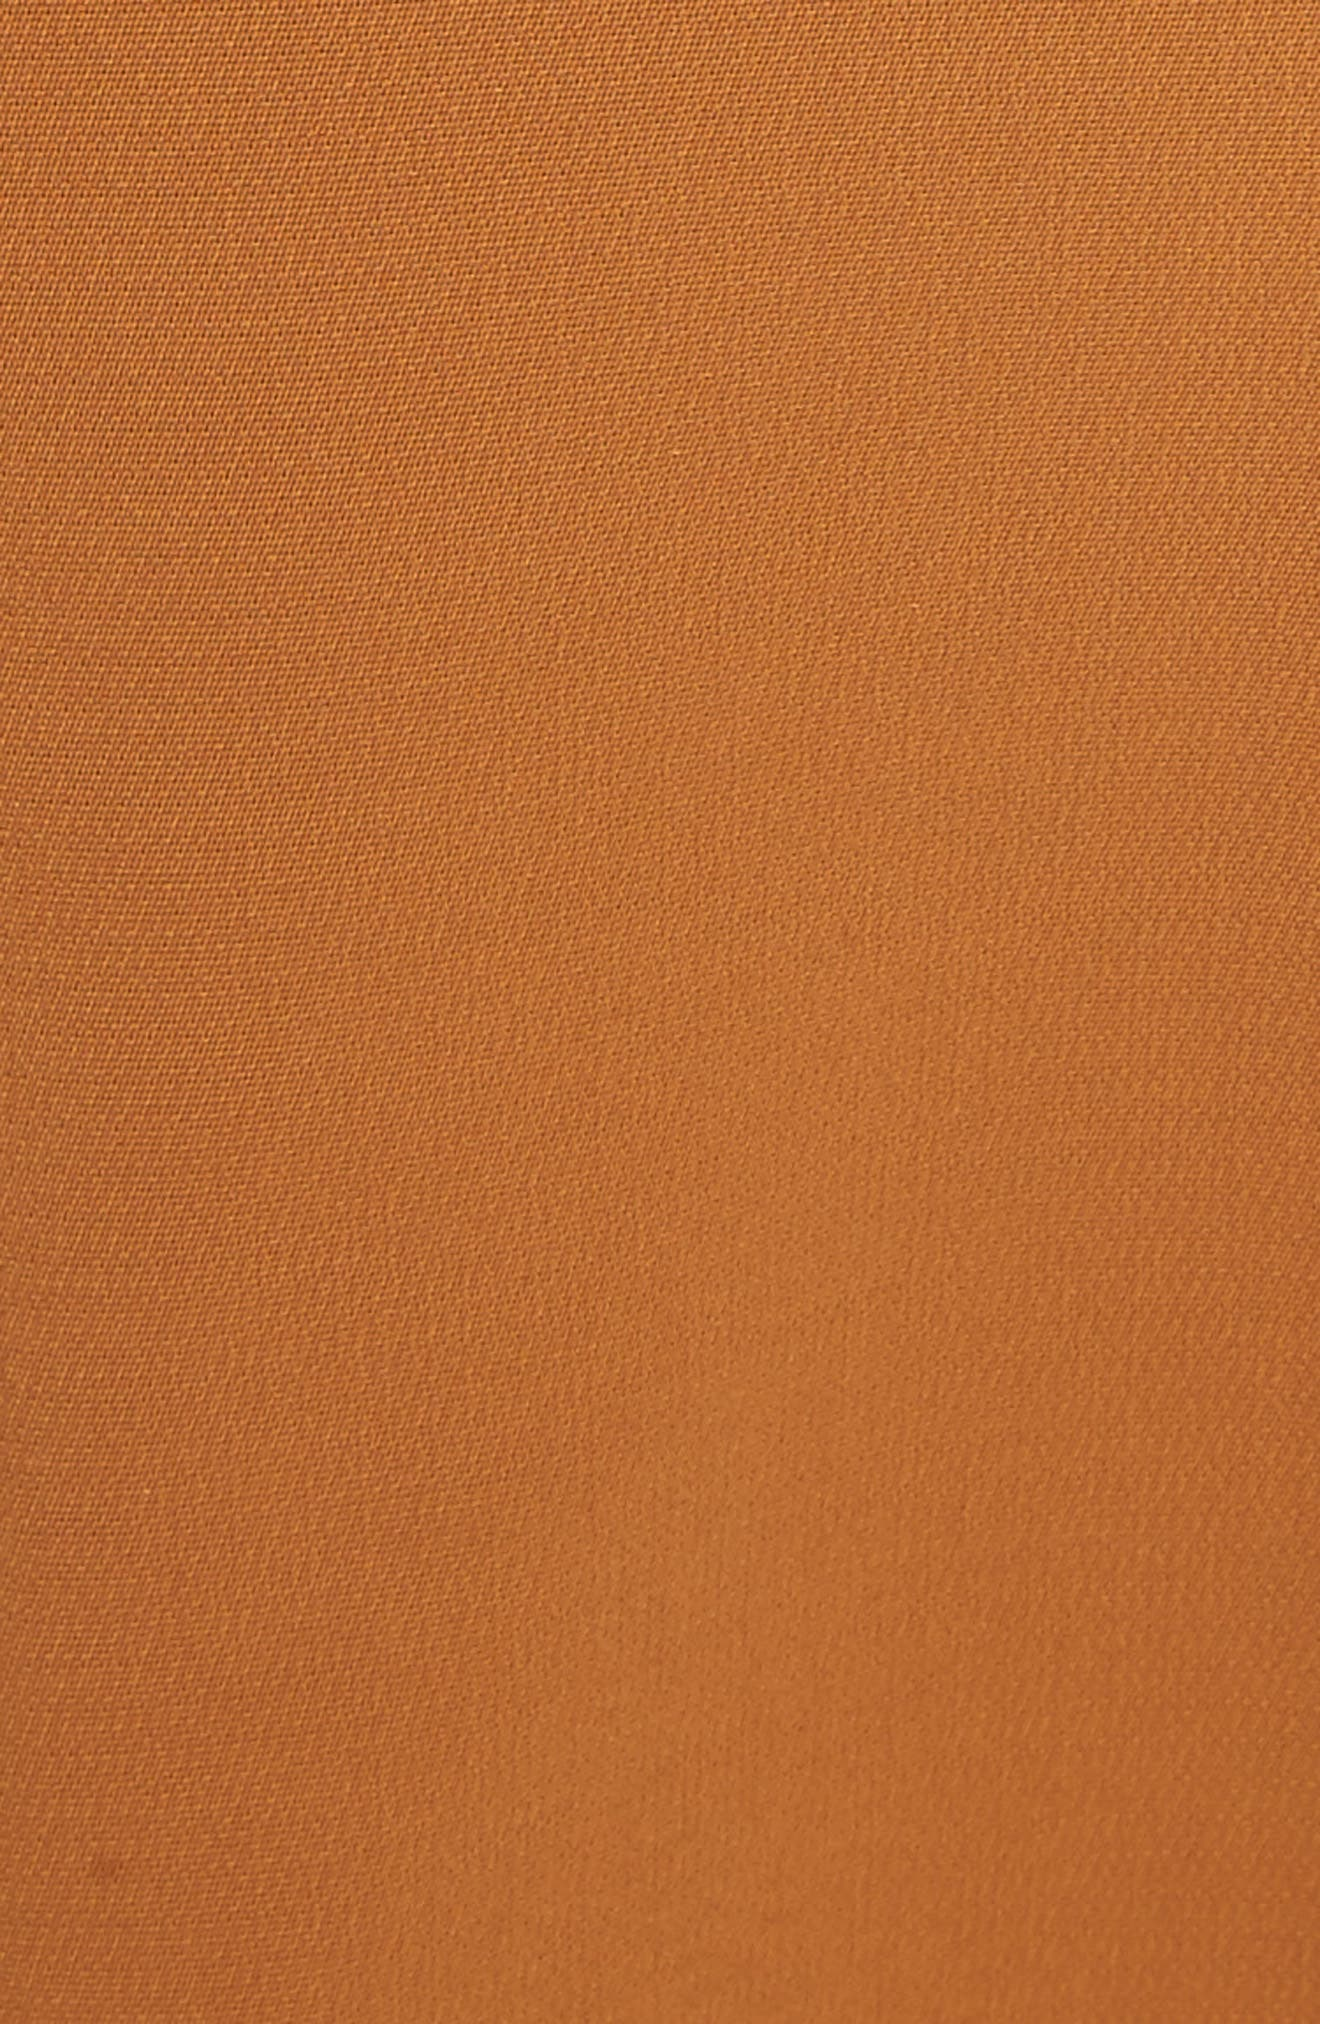 Sander Buckle Strap Midi Dress,                             Alternate thumbnail 10, color,